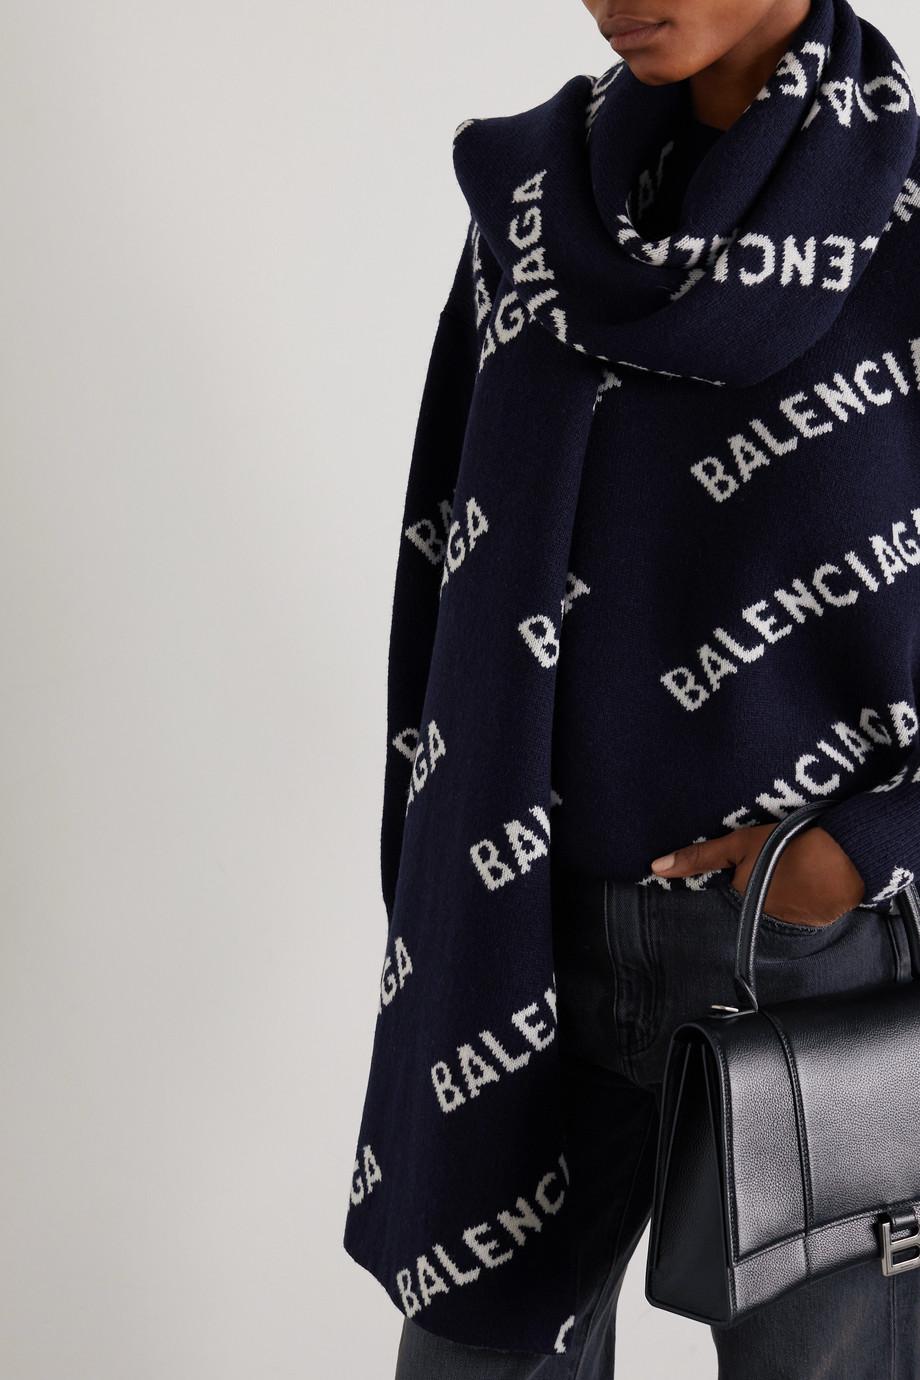 Balenciaga Écharpe en laine mélangée intarsia